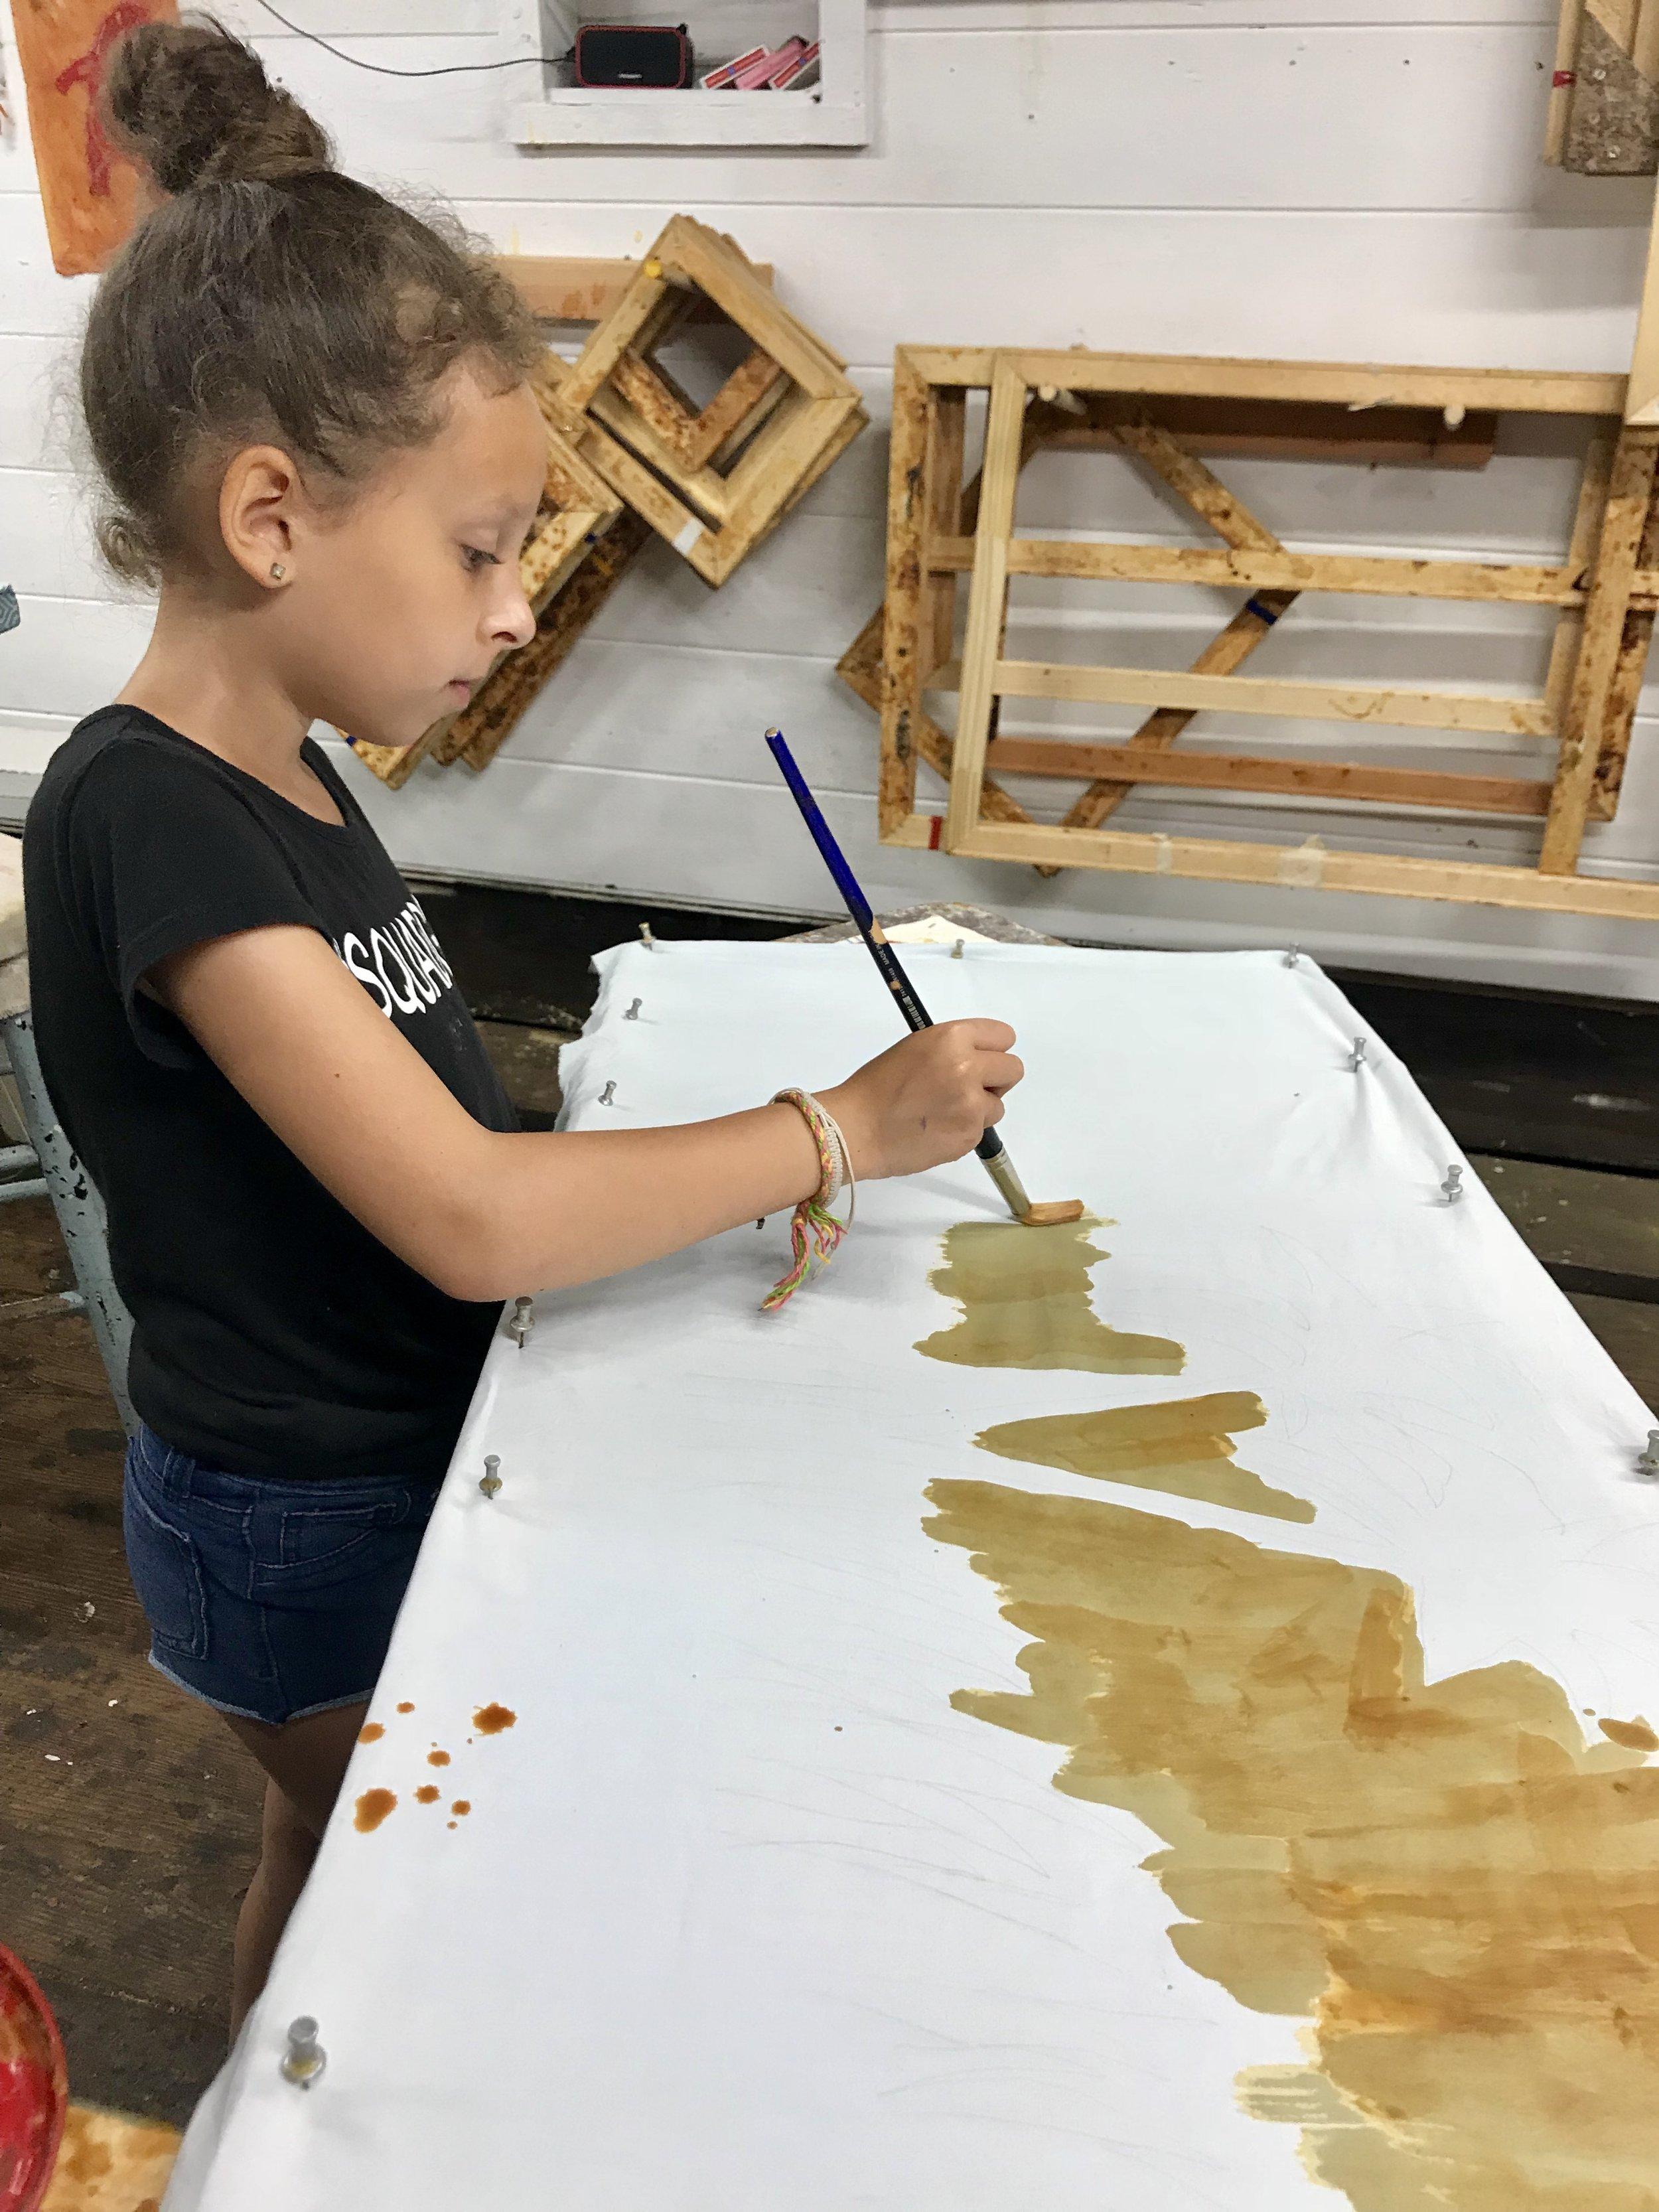 Painting wax on fabric.